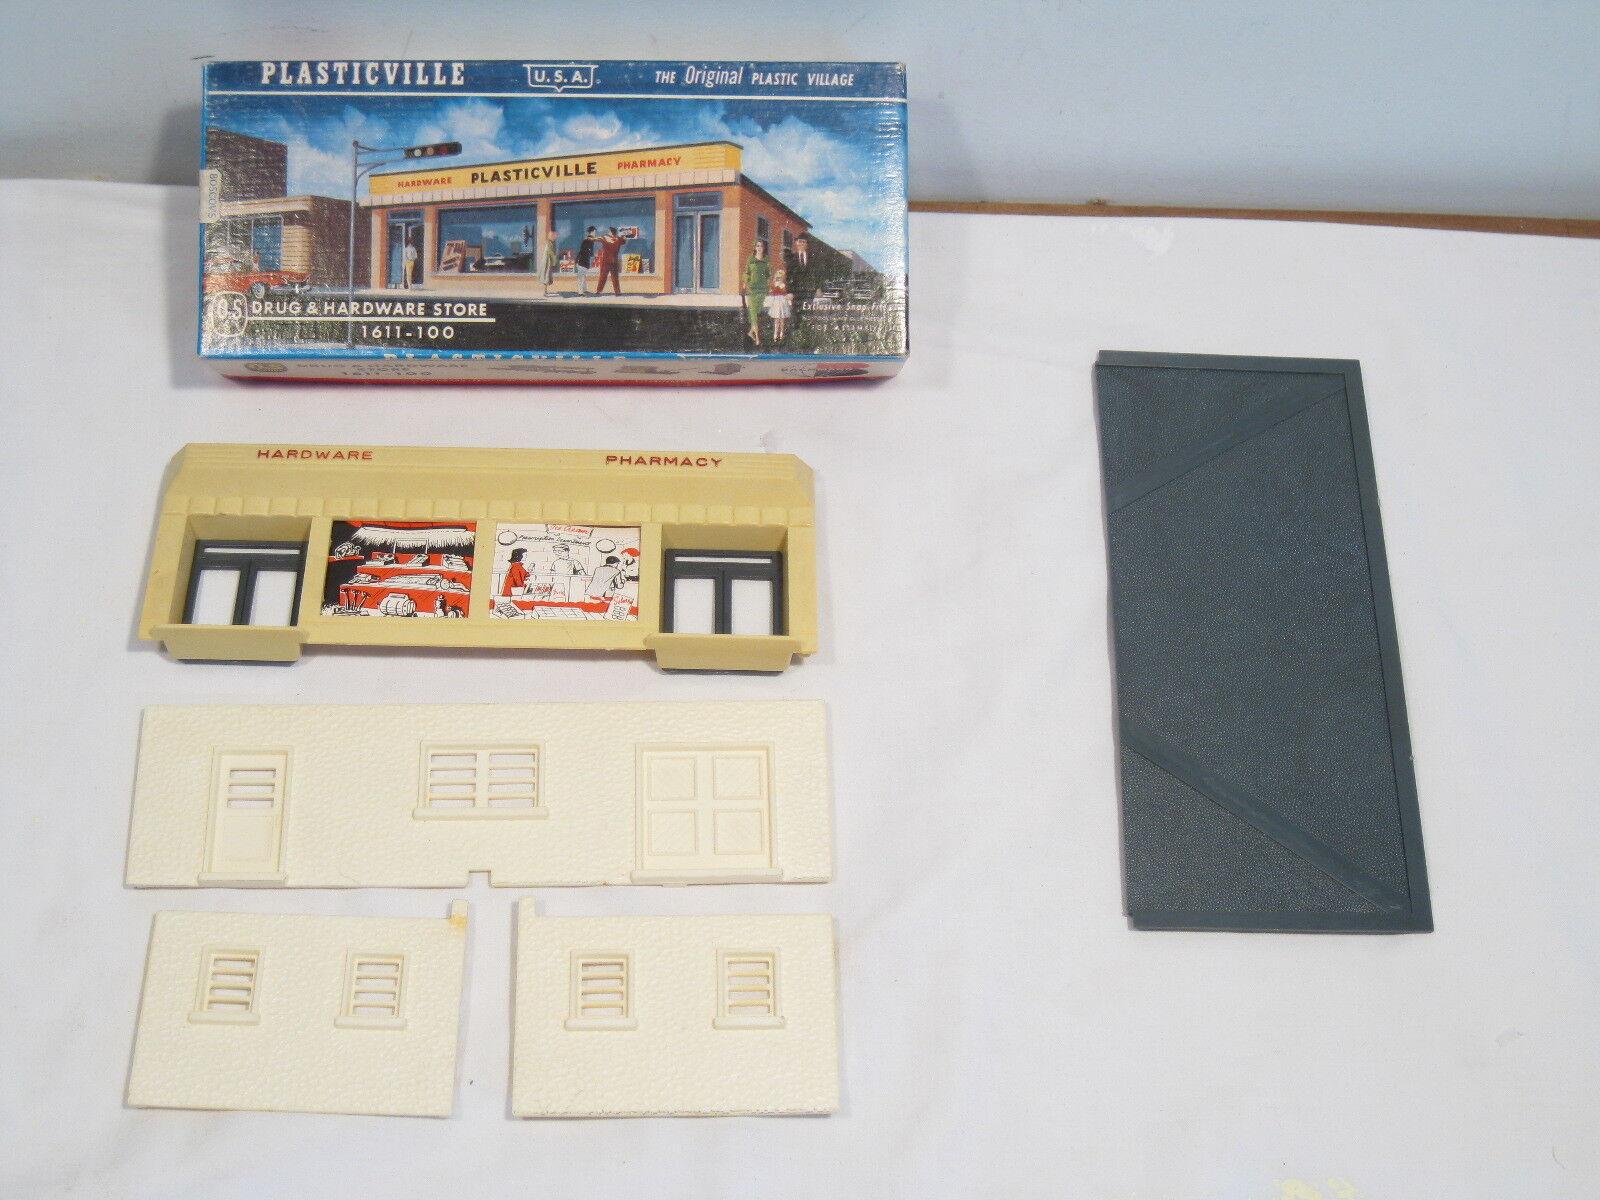 PLASTICVILLE O & S GAUGE DRUG & HARDWARE STORE 1611-100, COMPLETE, RARE BOX